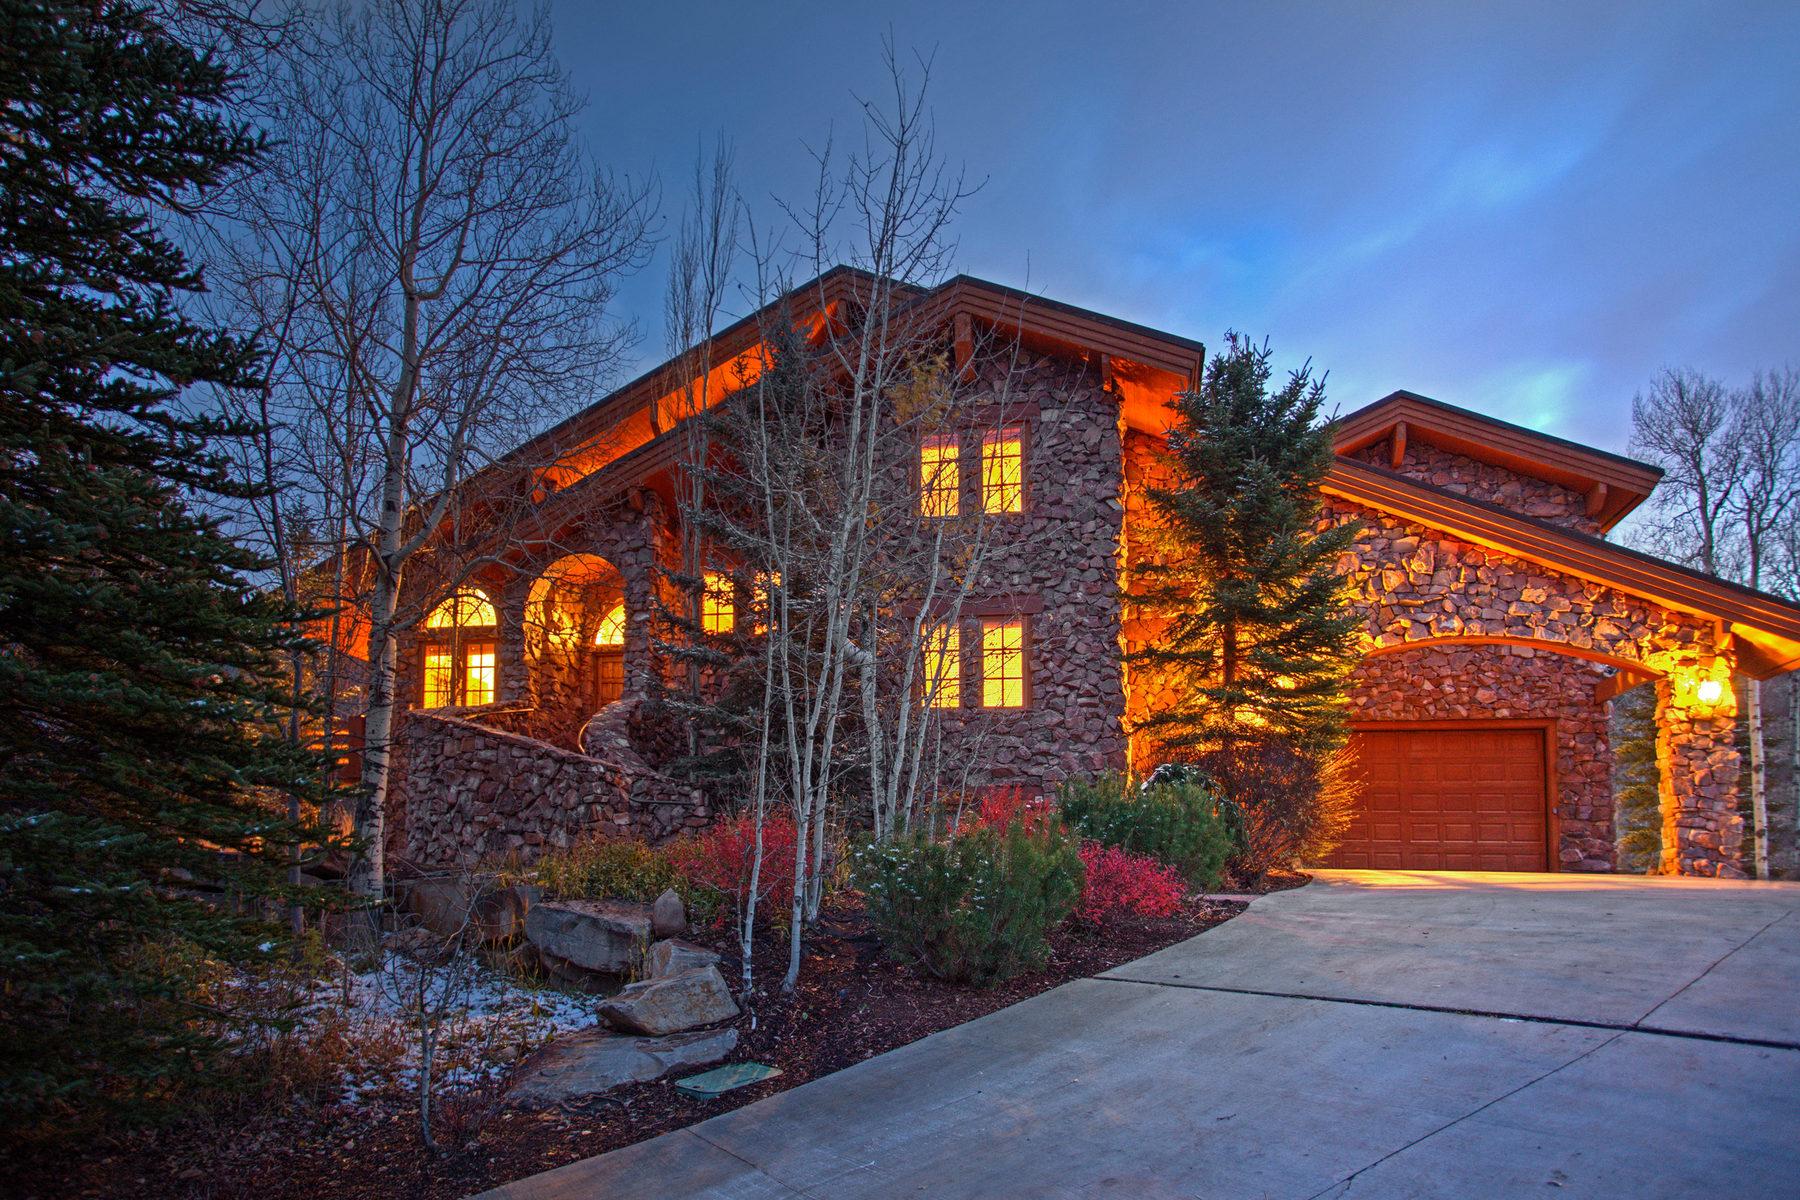 獨棟家庭住宅 為 出售 在 Heavily Wooded Mountain Home 8281 Trails Dr Park City, 猶他州, 84098 美國